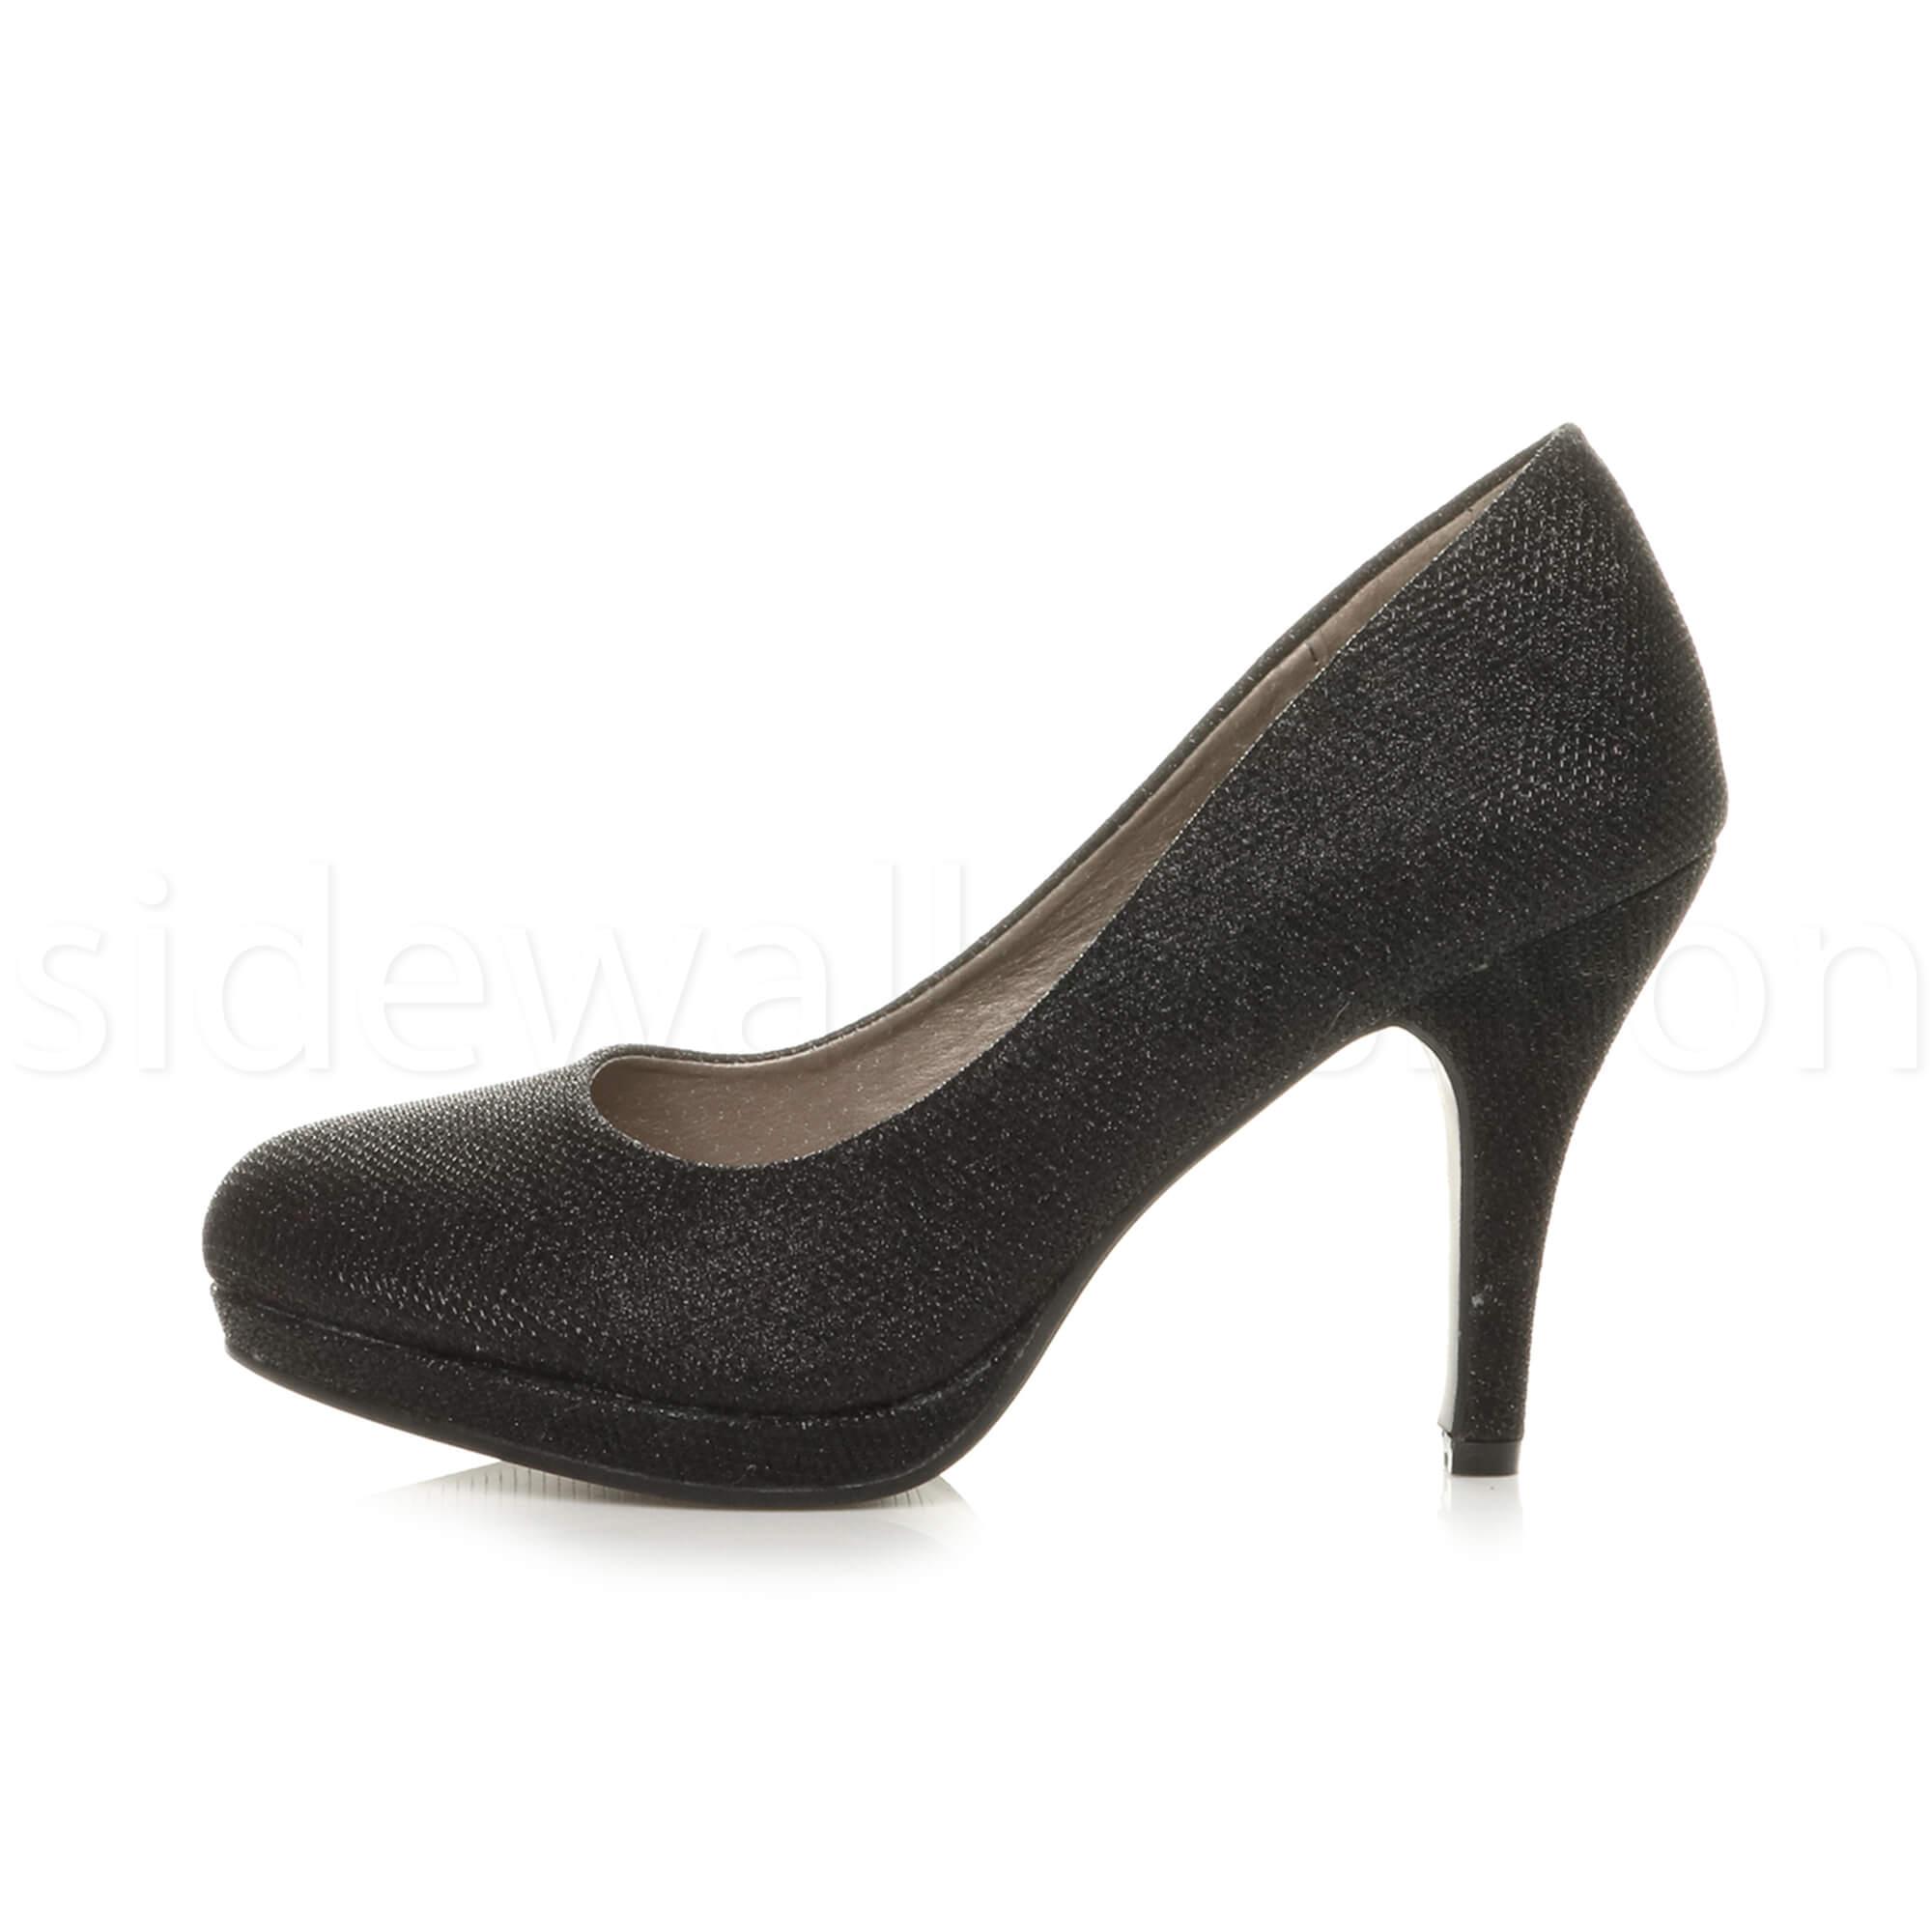 Womens-ladies-high-mid-heel-platform-wedding-evening-bridesmaid-court-shoes-size thumbnail 10